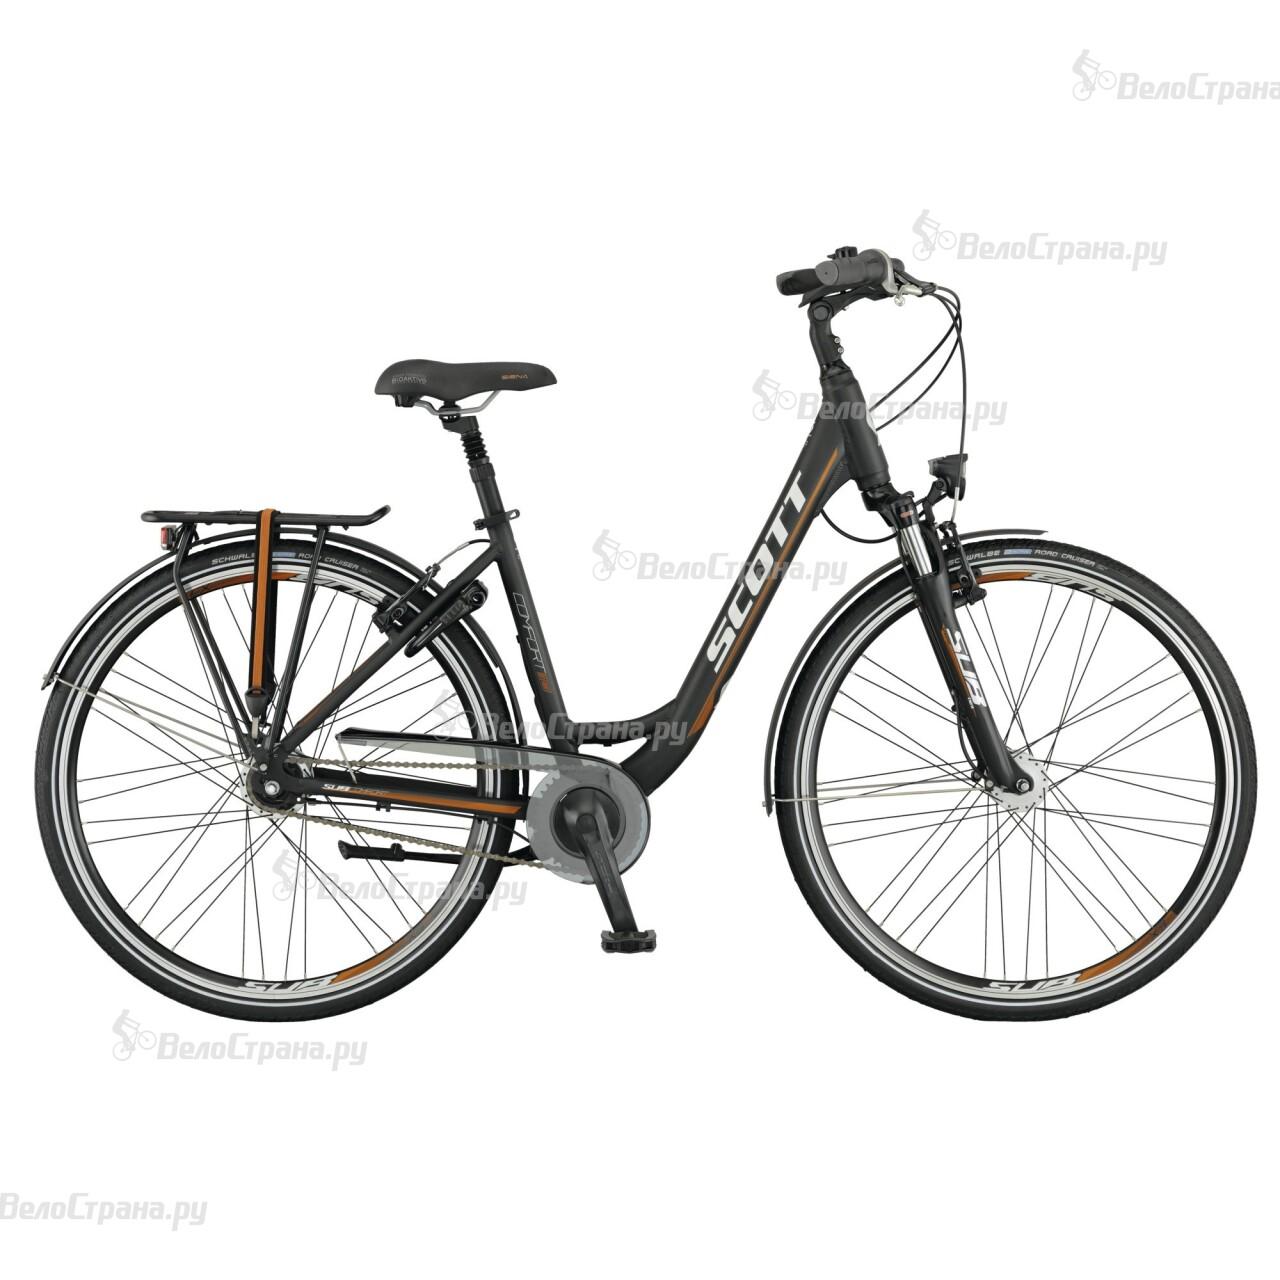 Велосипед Scott SUB Comfort 10 Lady (2015) цены онлайн